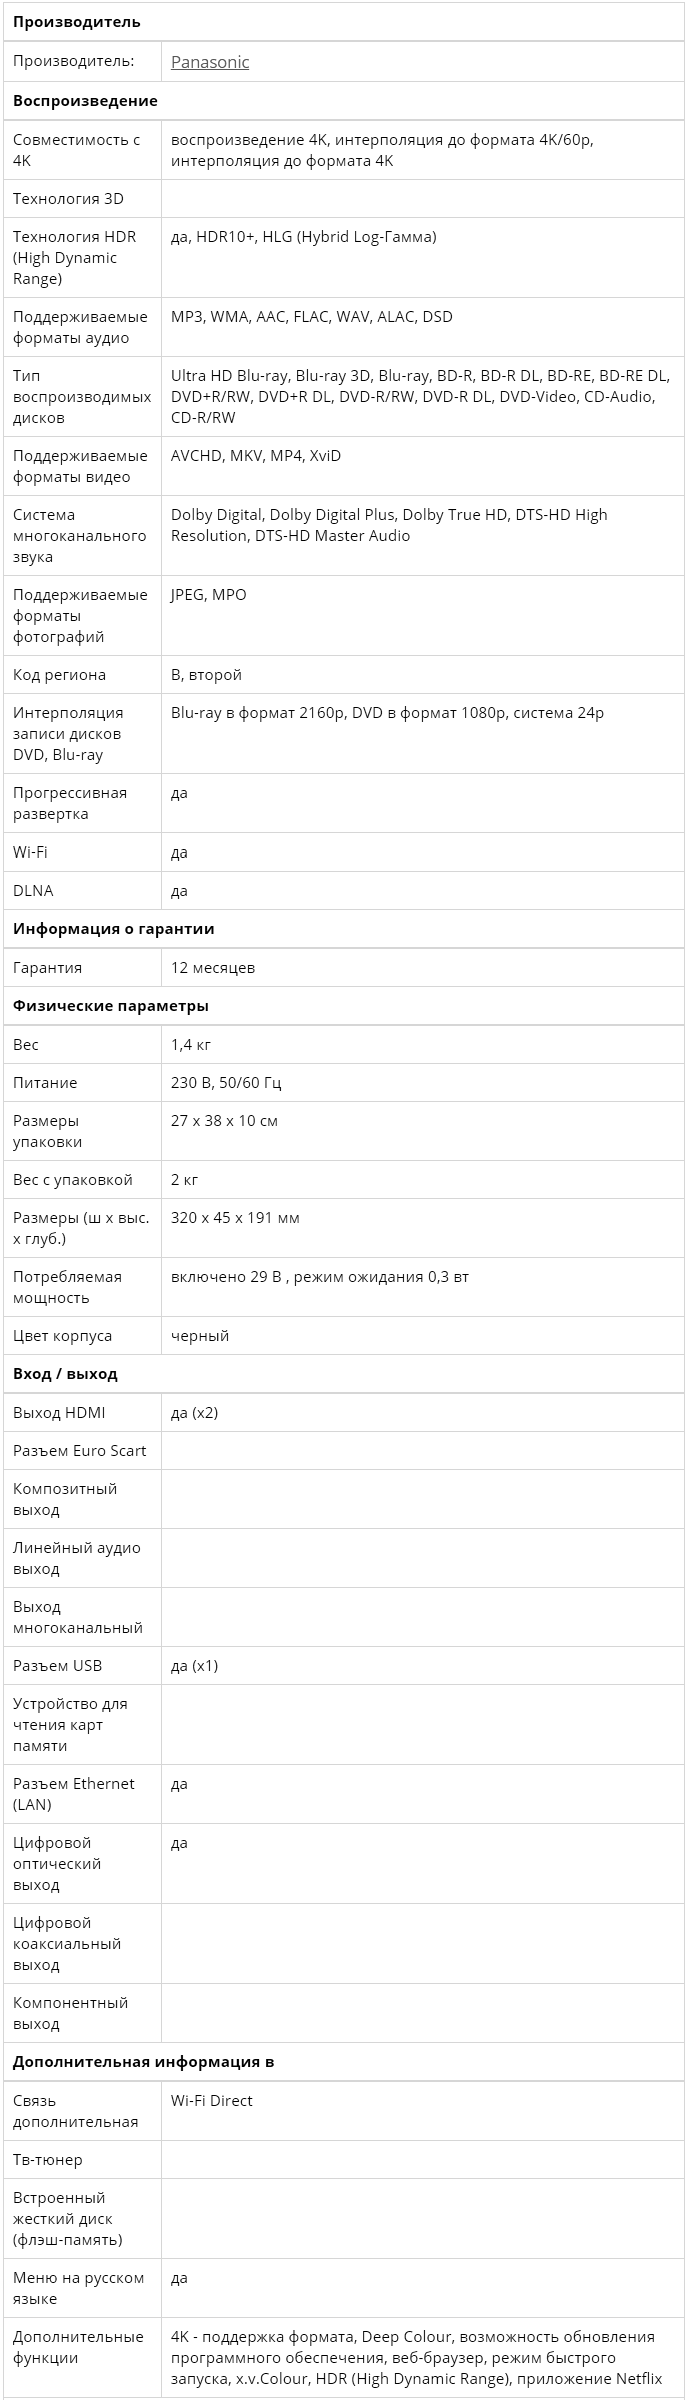 Характеристики UB420